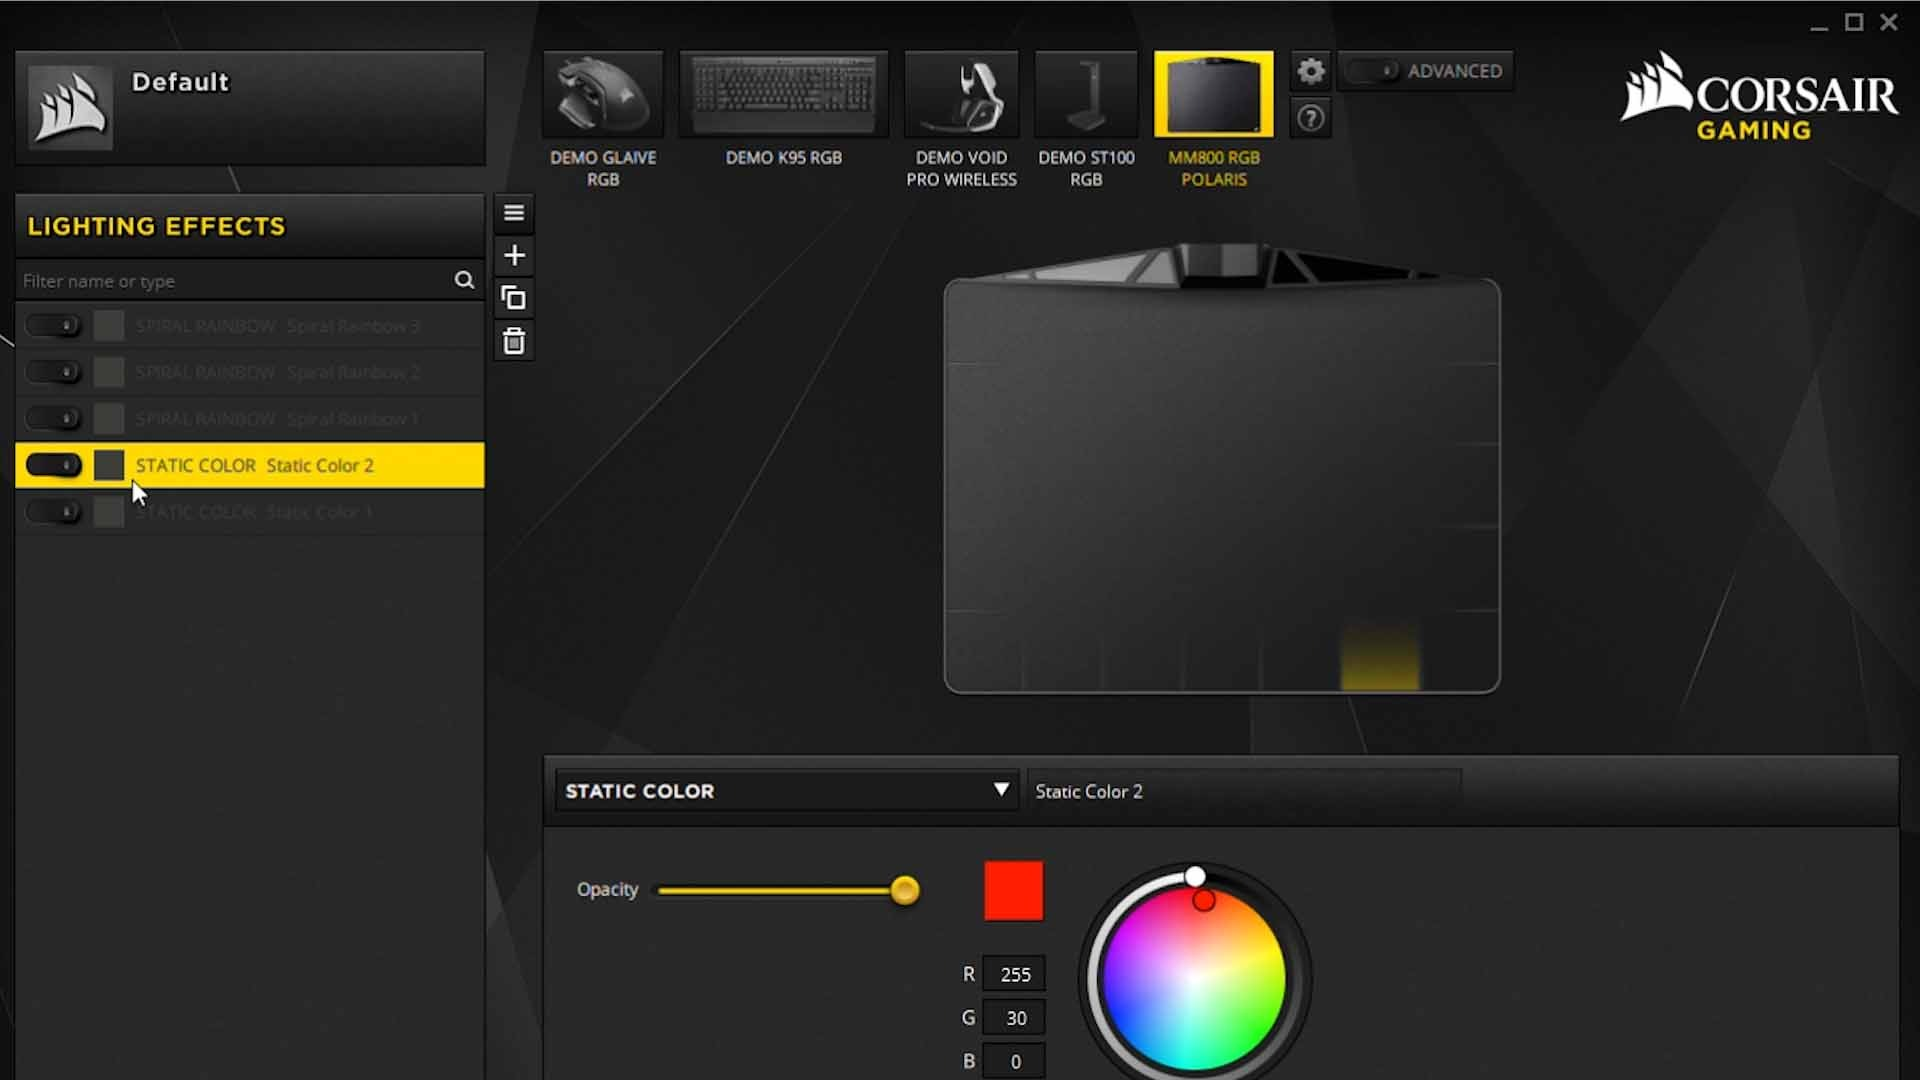 Software Corsair 800C unsmushed - Corsair MM800C Mousepad Review - RGB Overload?